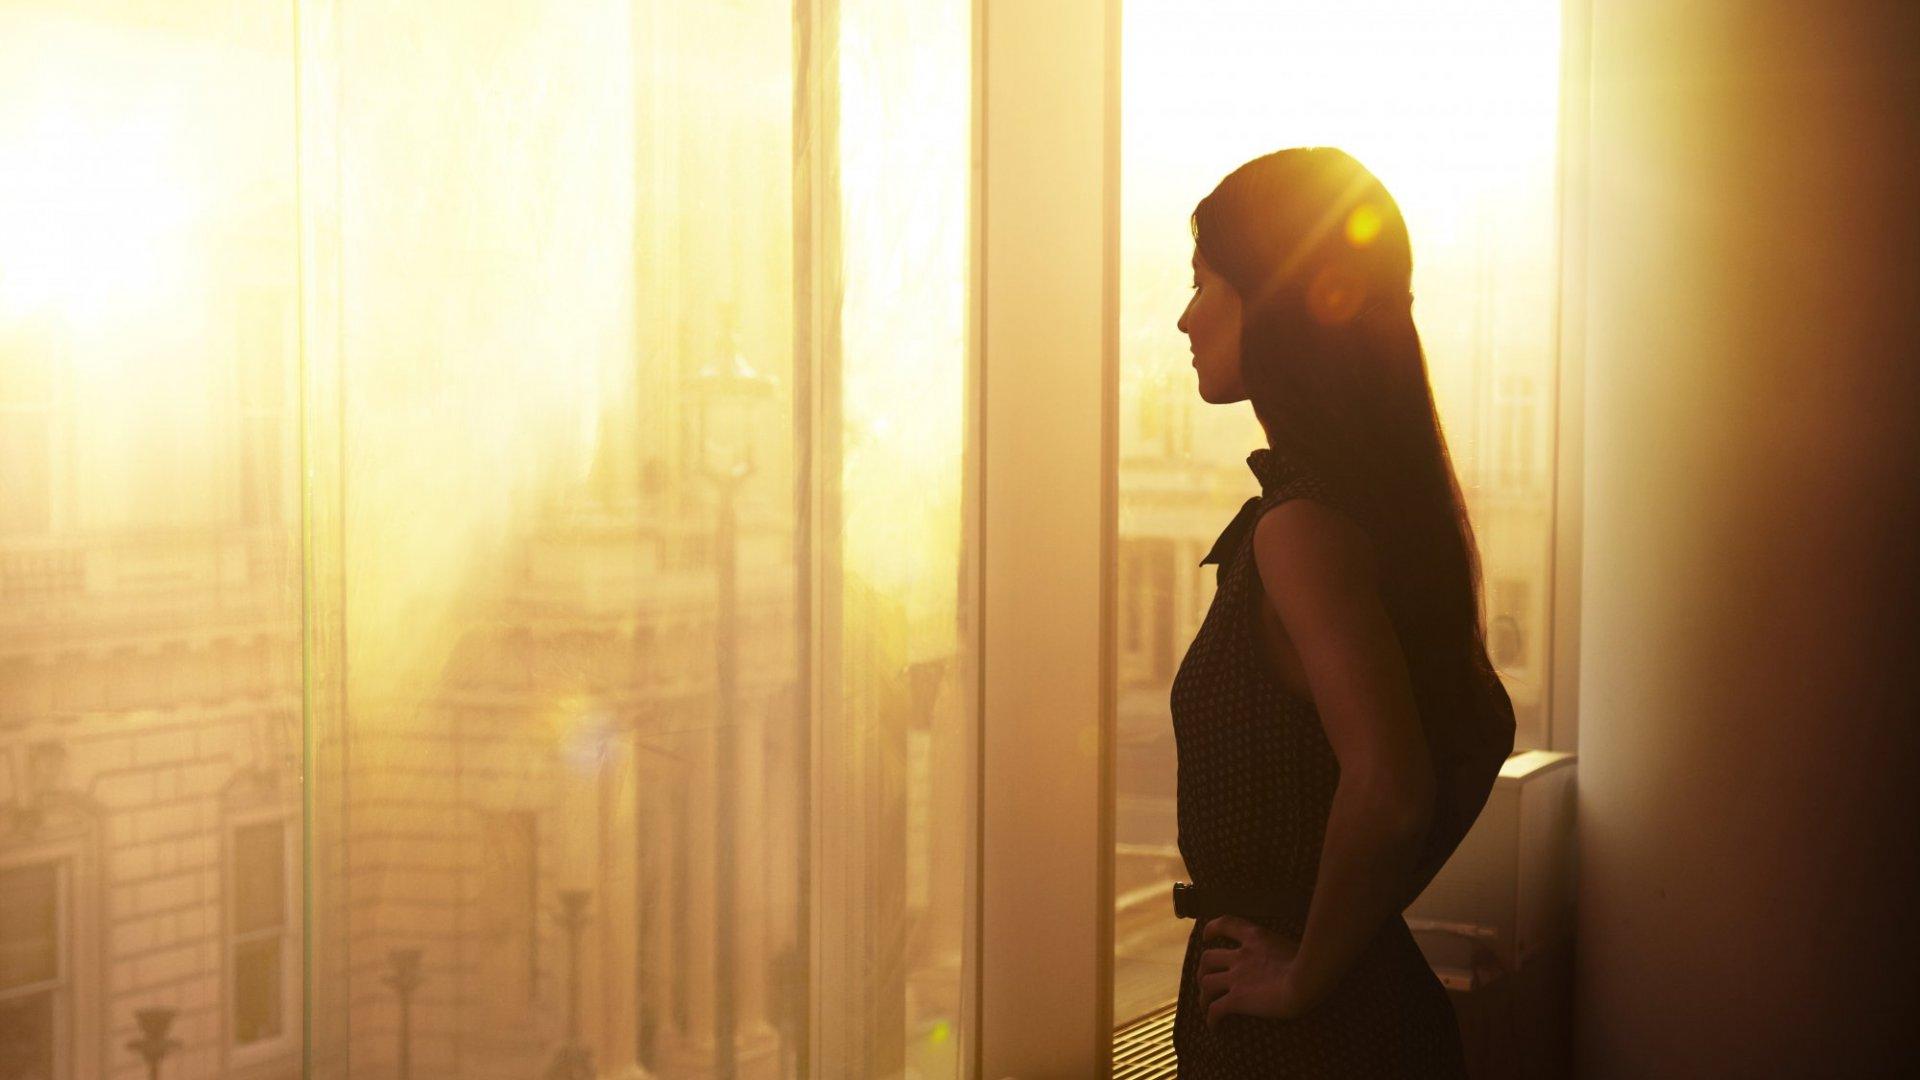 5 Ways Women Have an Edge